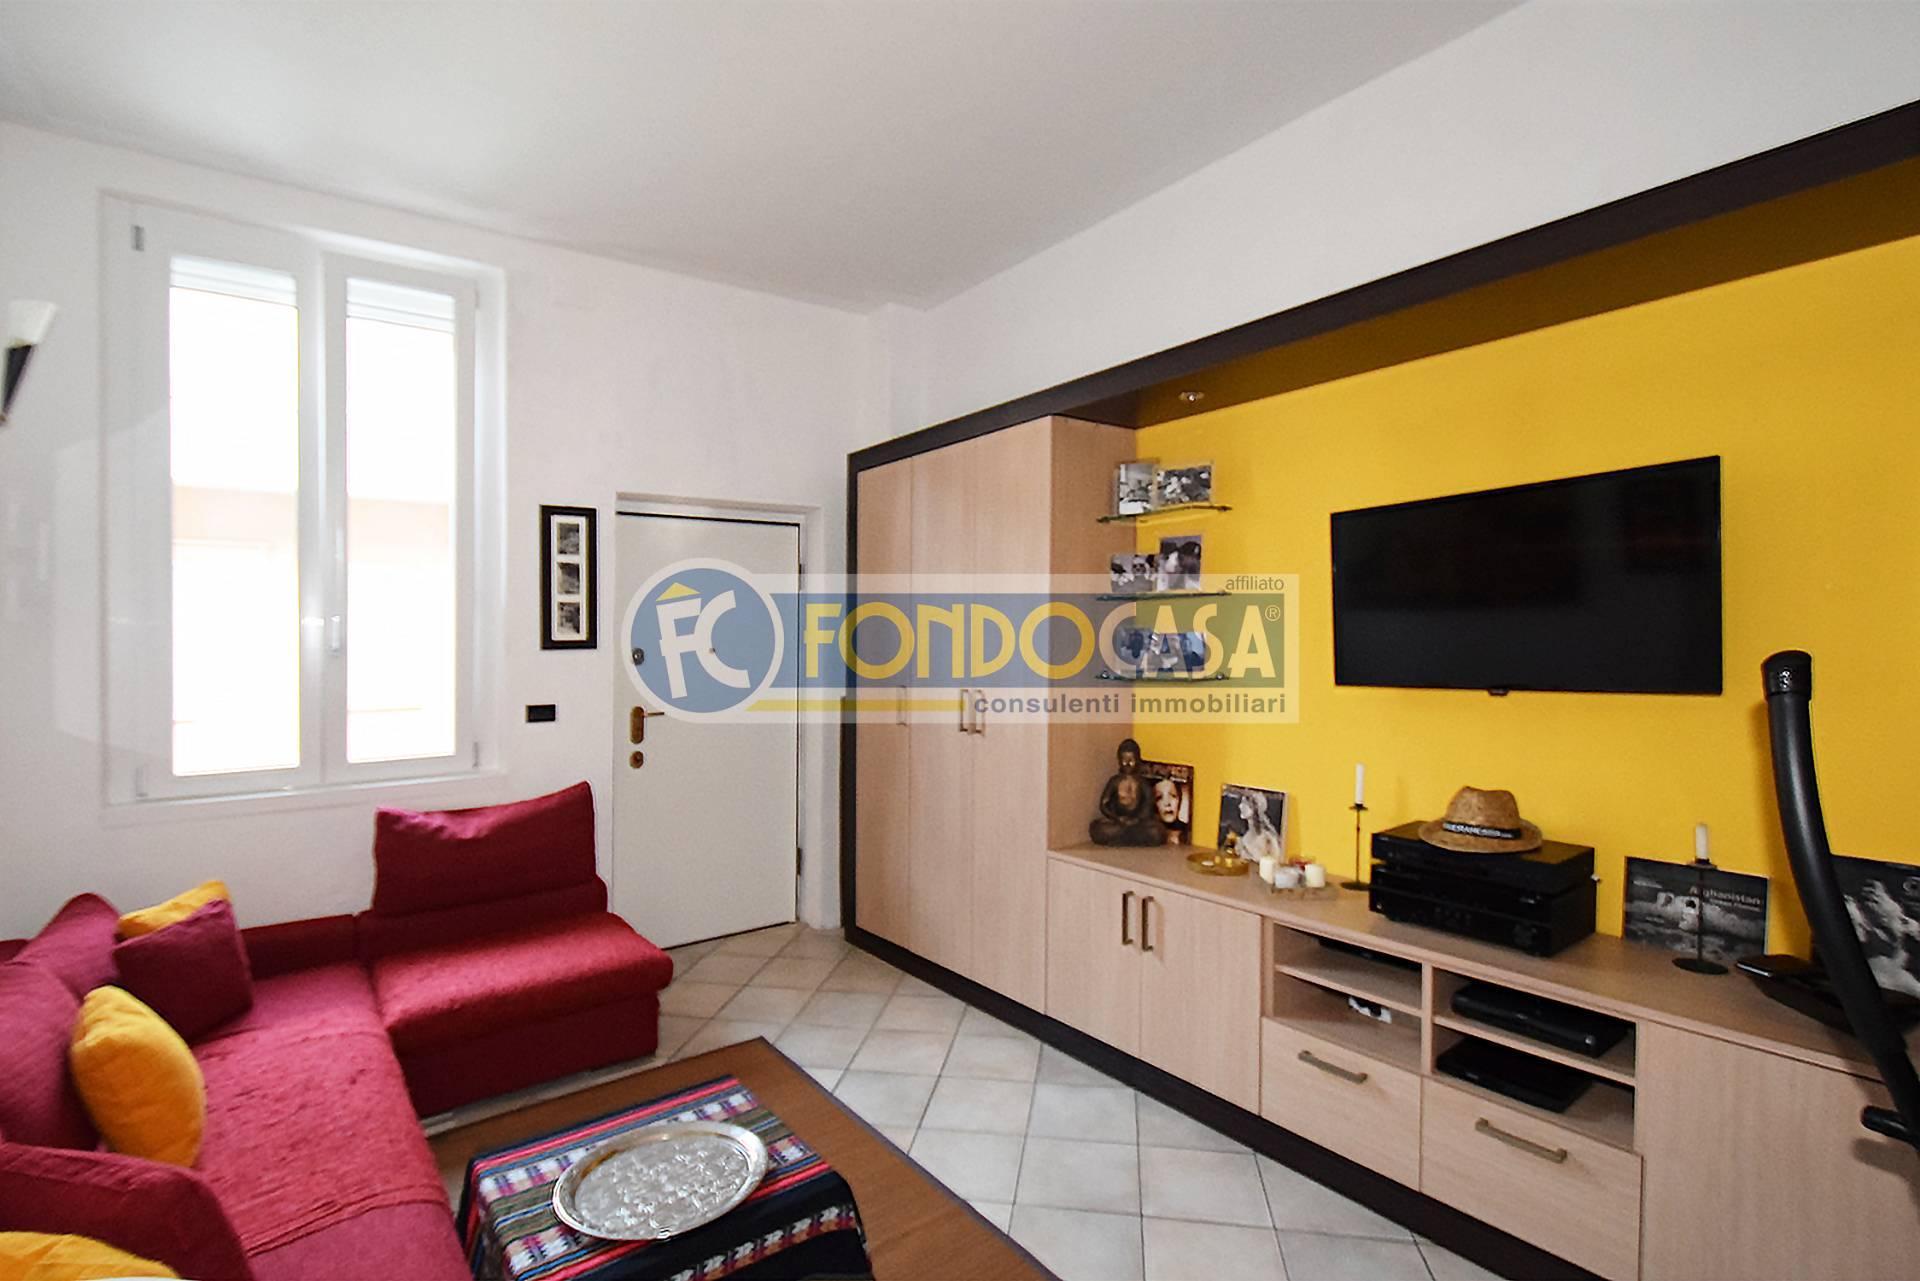 Camera Matrimoniale A Udine.Appartamenti Milano Udine In Vendita